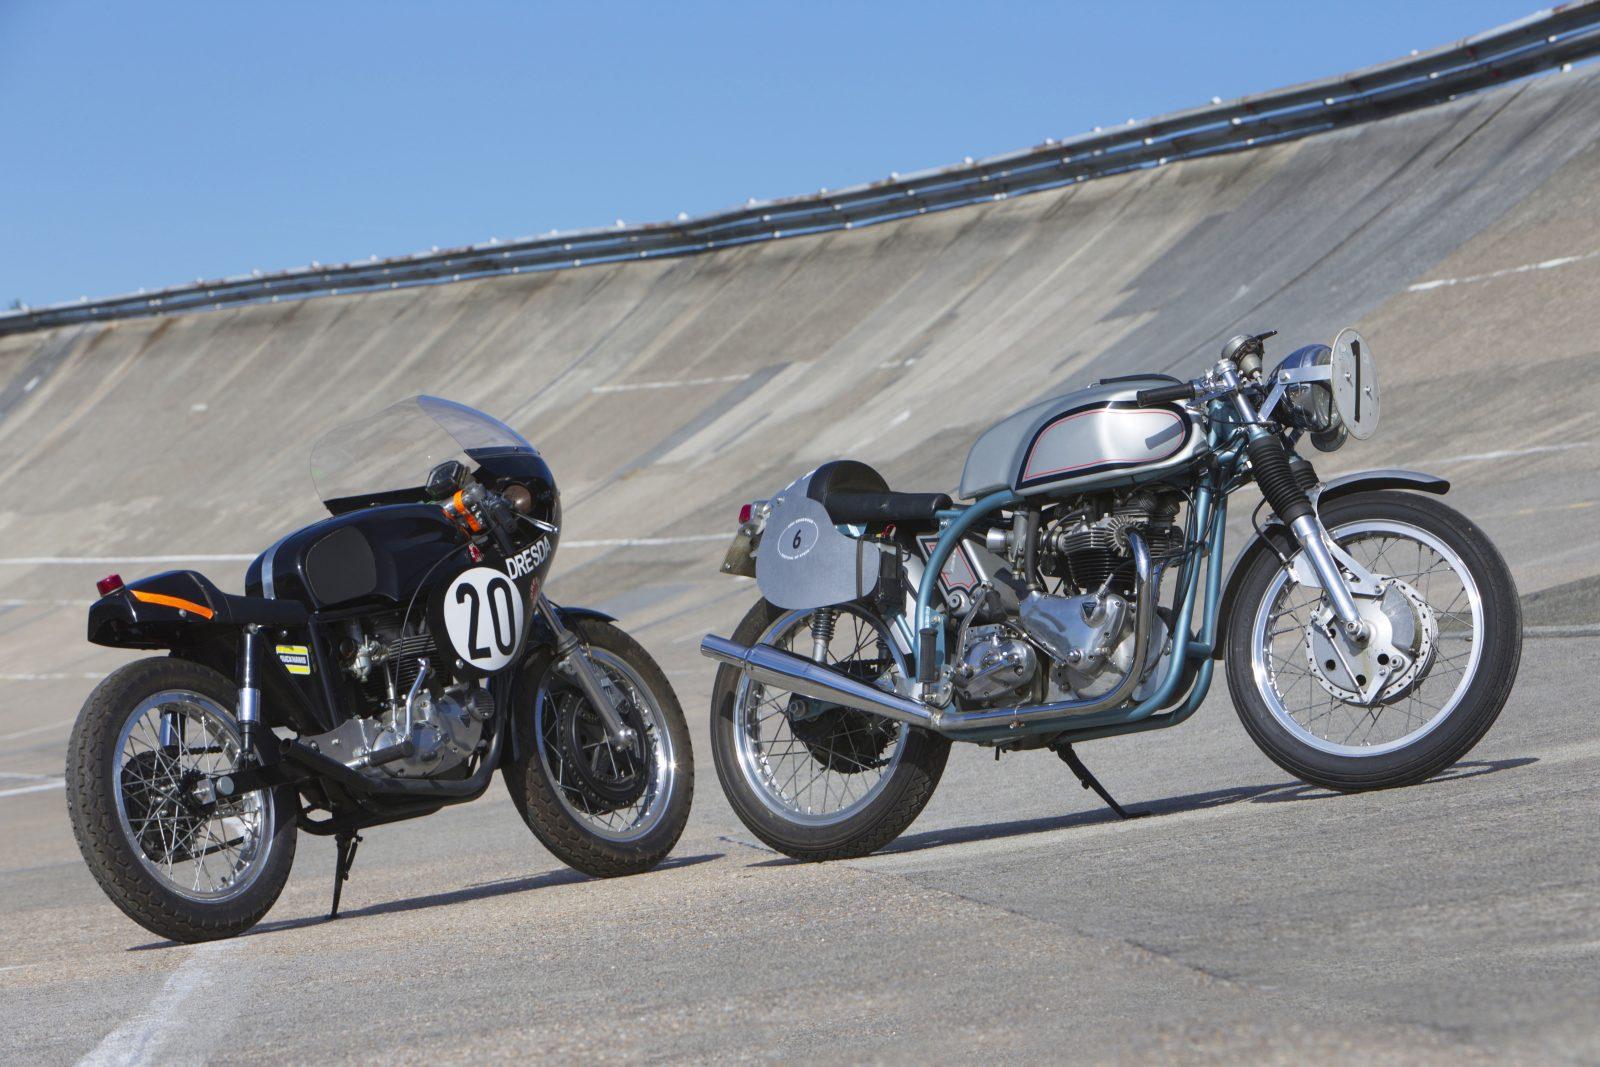 Dresda Triton And Triumph Australian Motorcycle News 1970 Honda Ct70 Fuel Tank